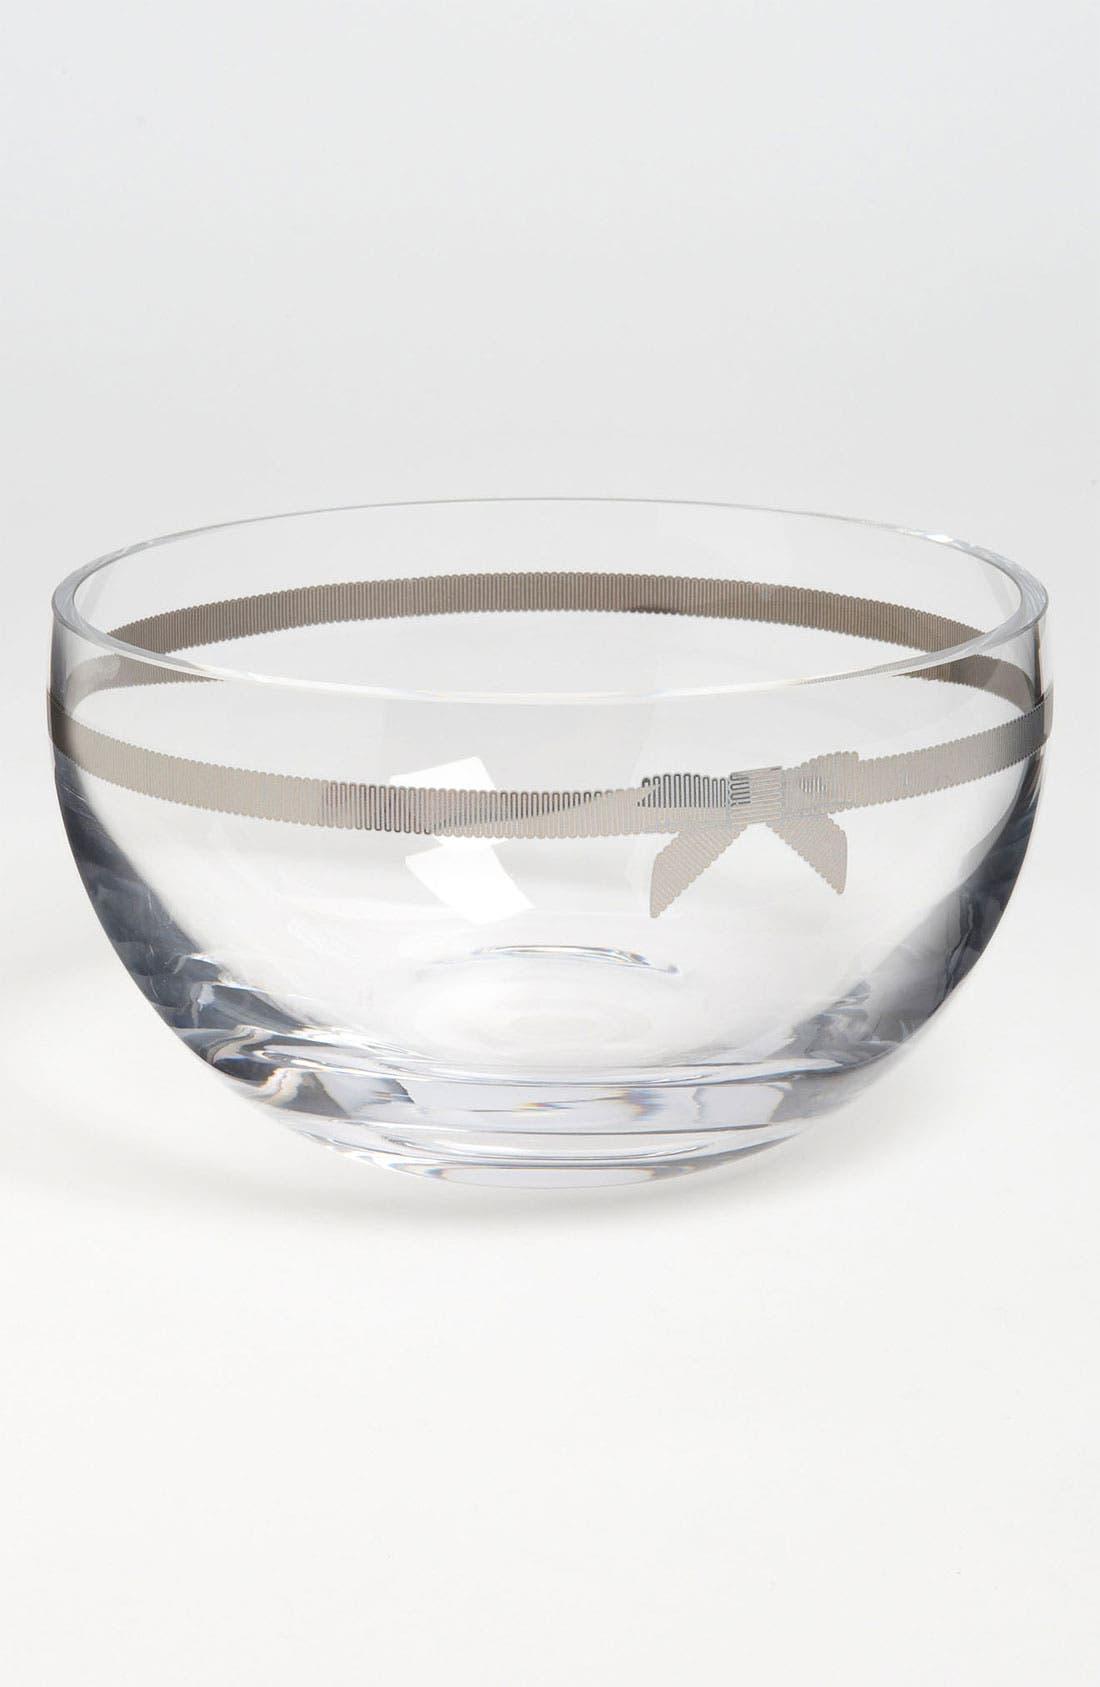 Main Image - kate spade new york 'grace avenue - large' bowl